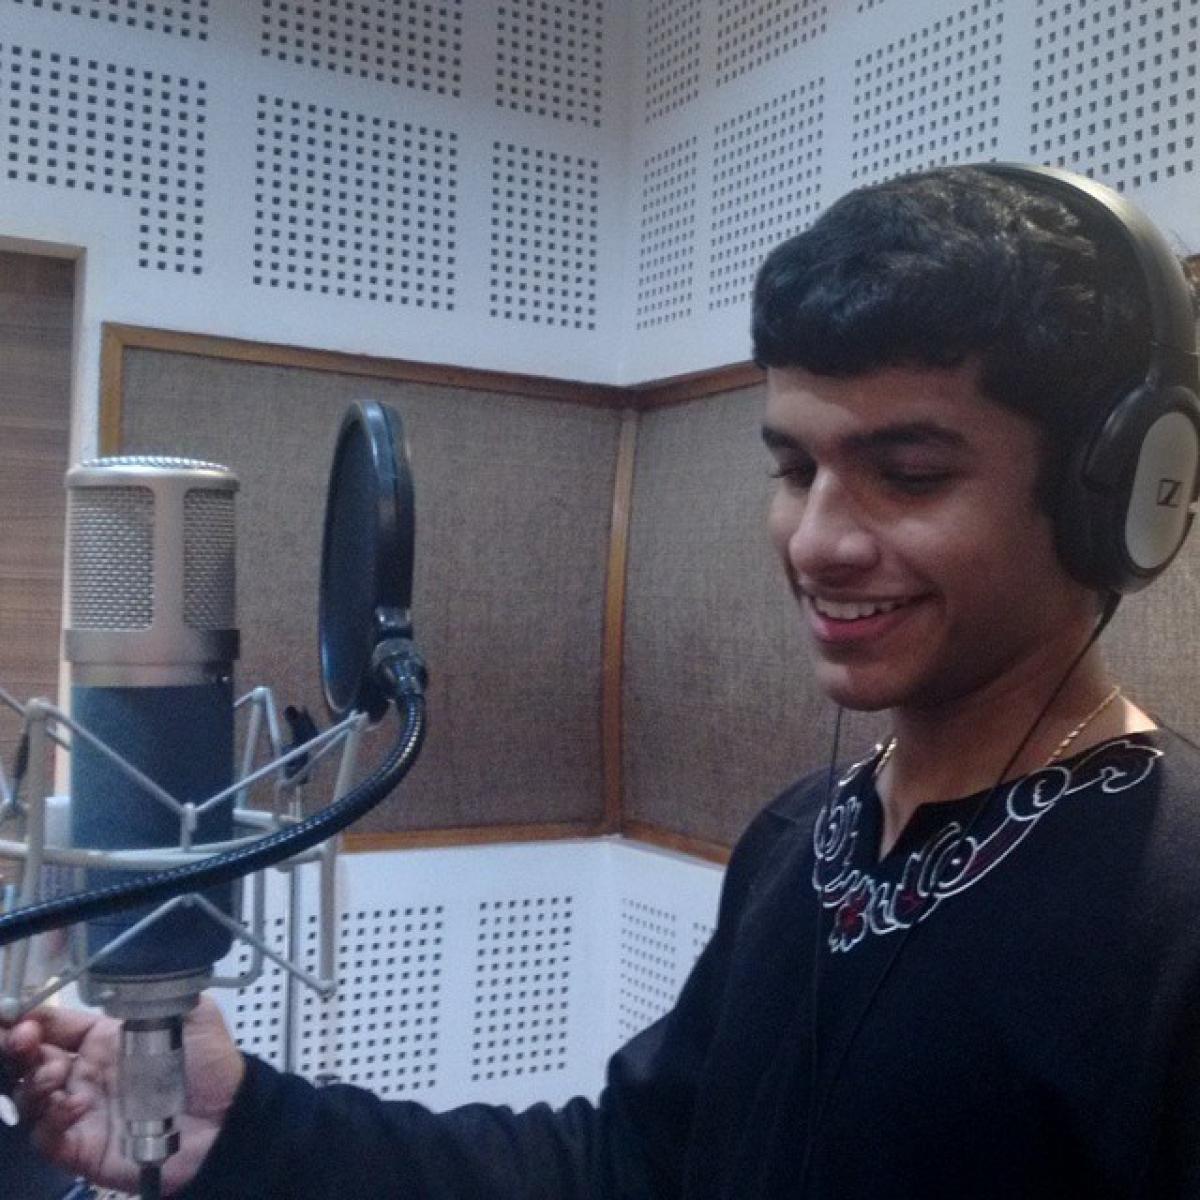 Watch: 'Chhota Mohammad Rafi' from Kozhikode has the internet awestruck struck